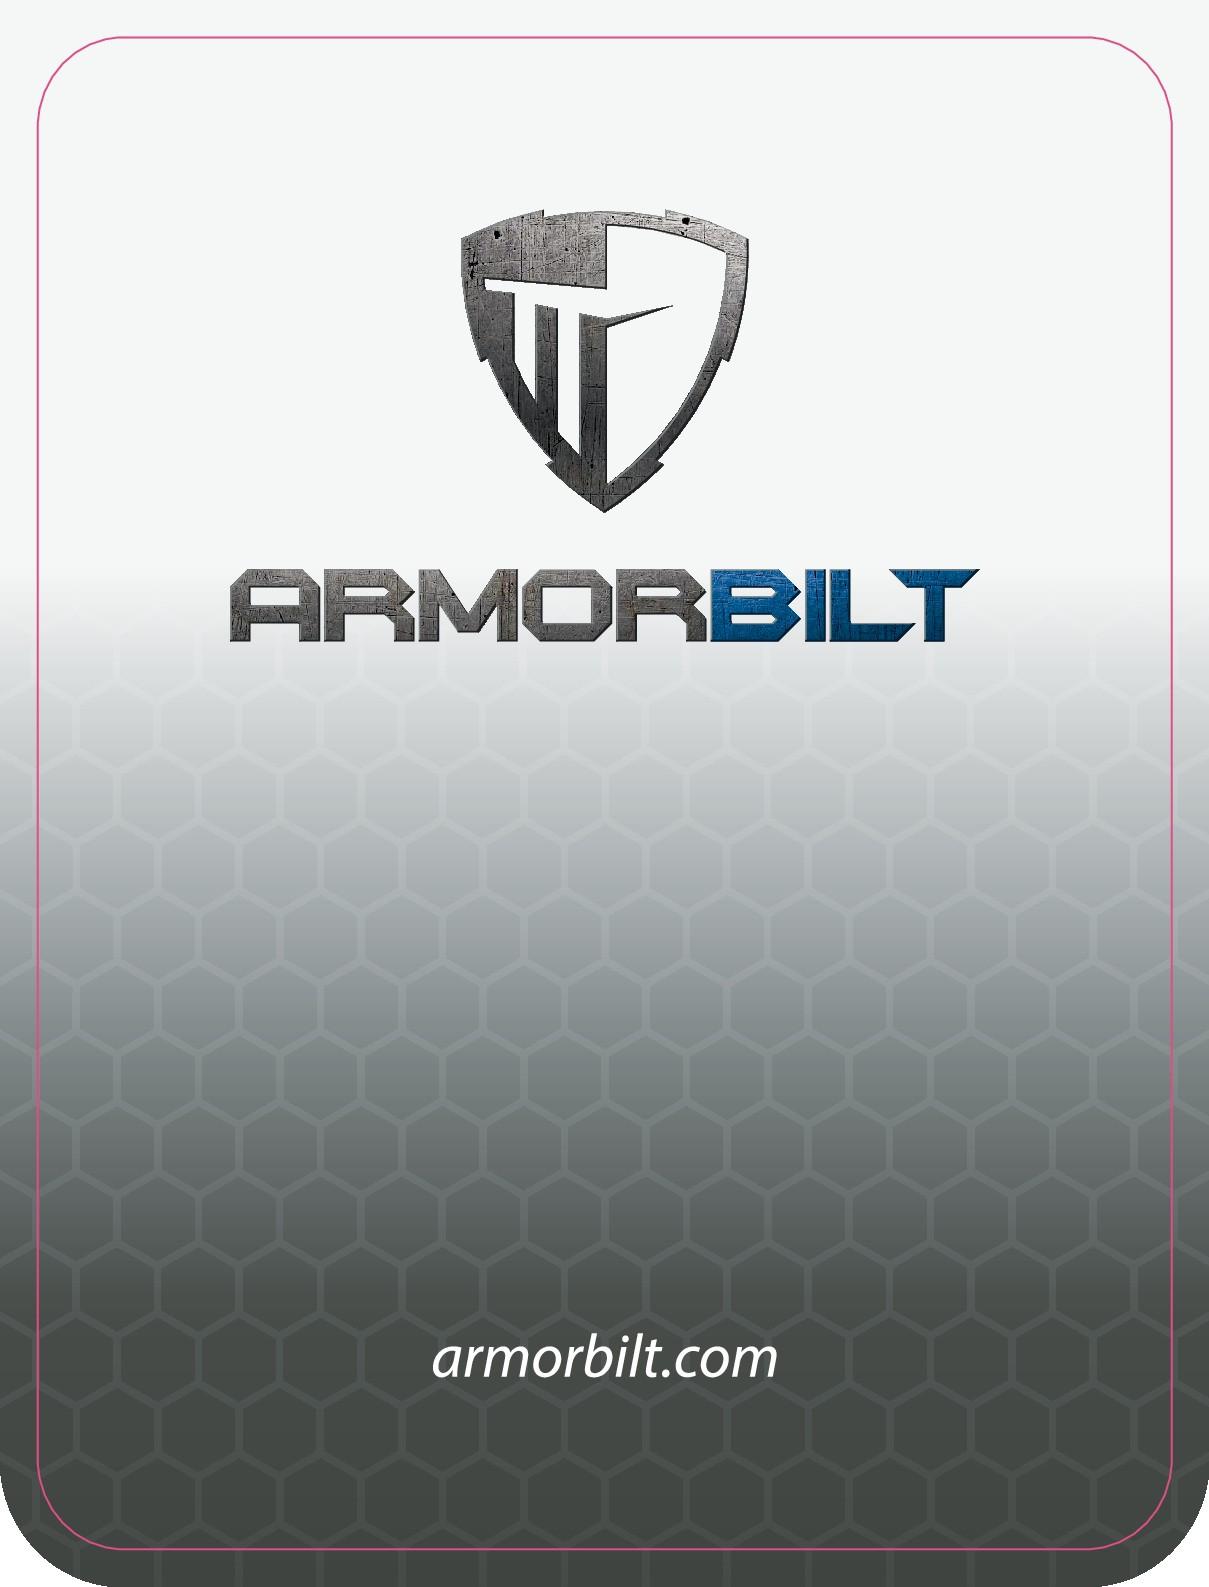 Armorbilt Tag